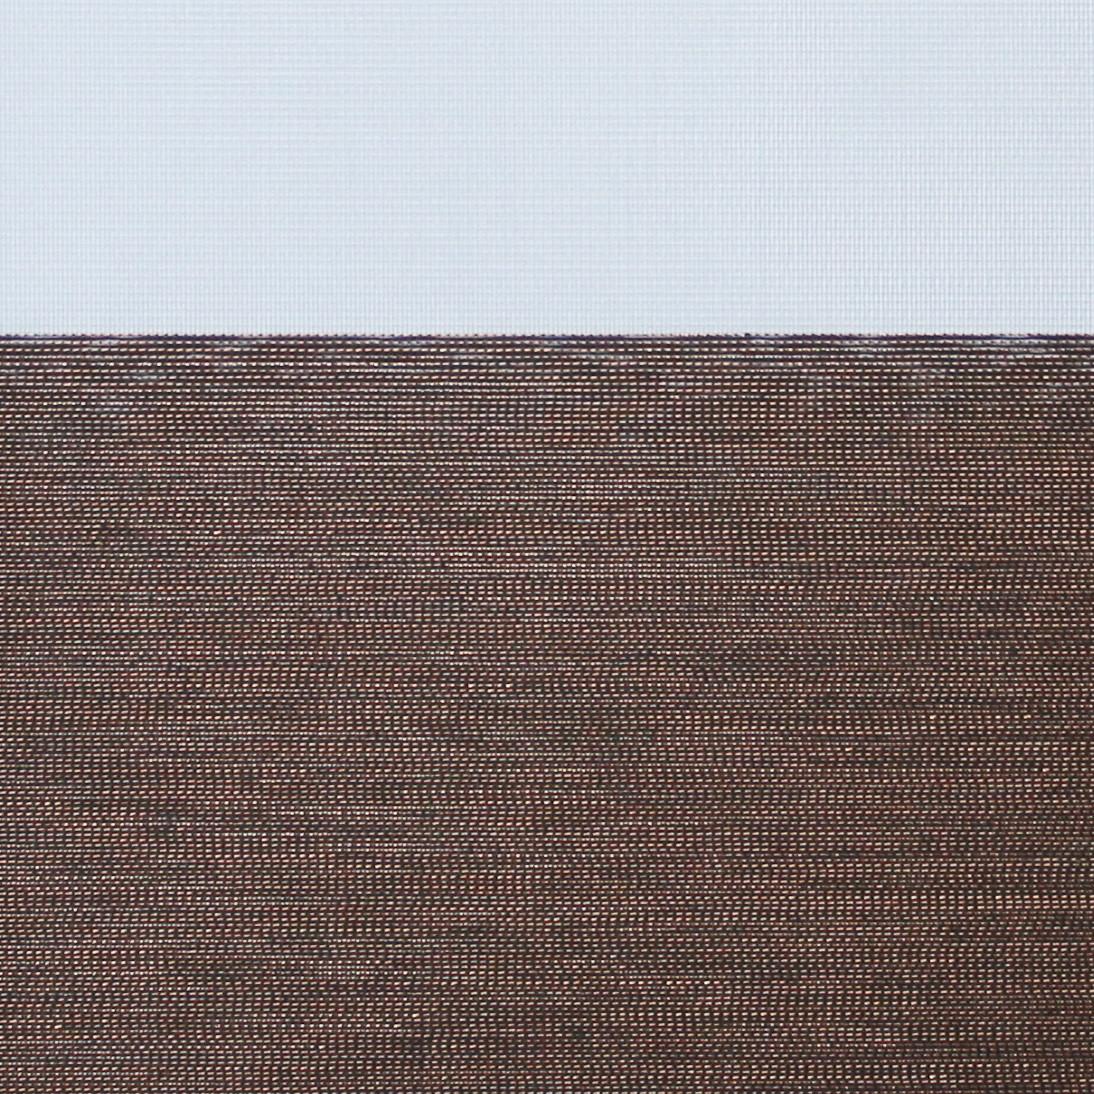 Рулонные шторы День-ночь Ткань Прада Бронза